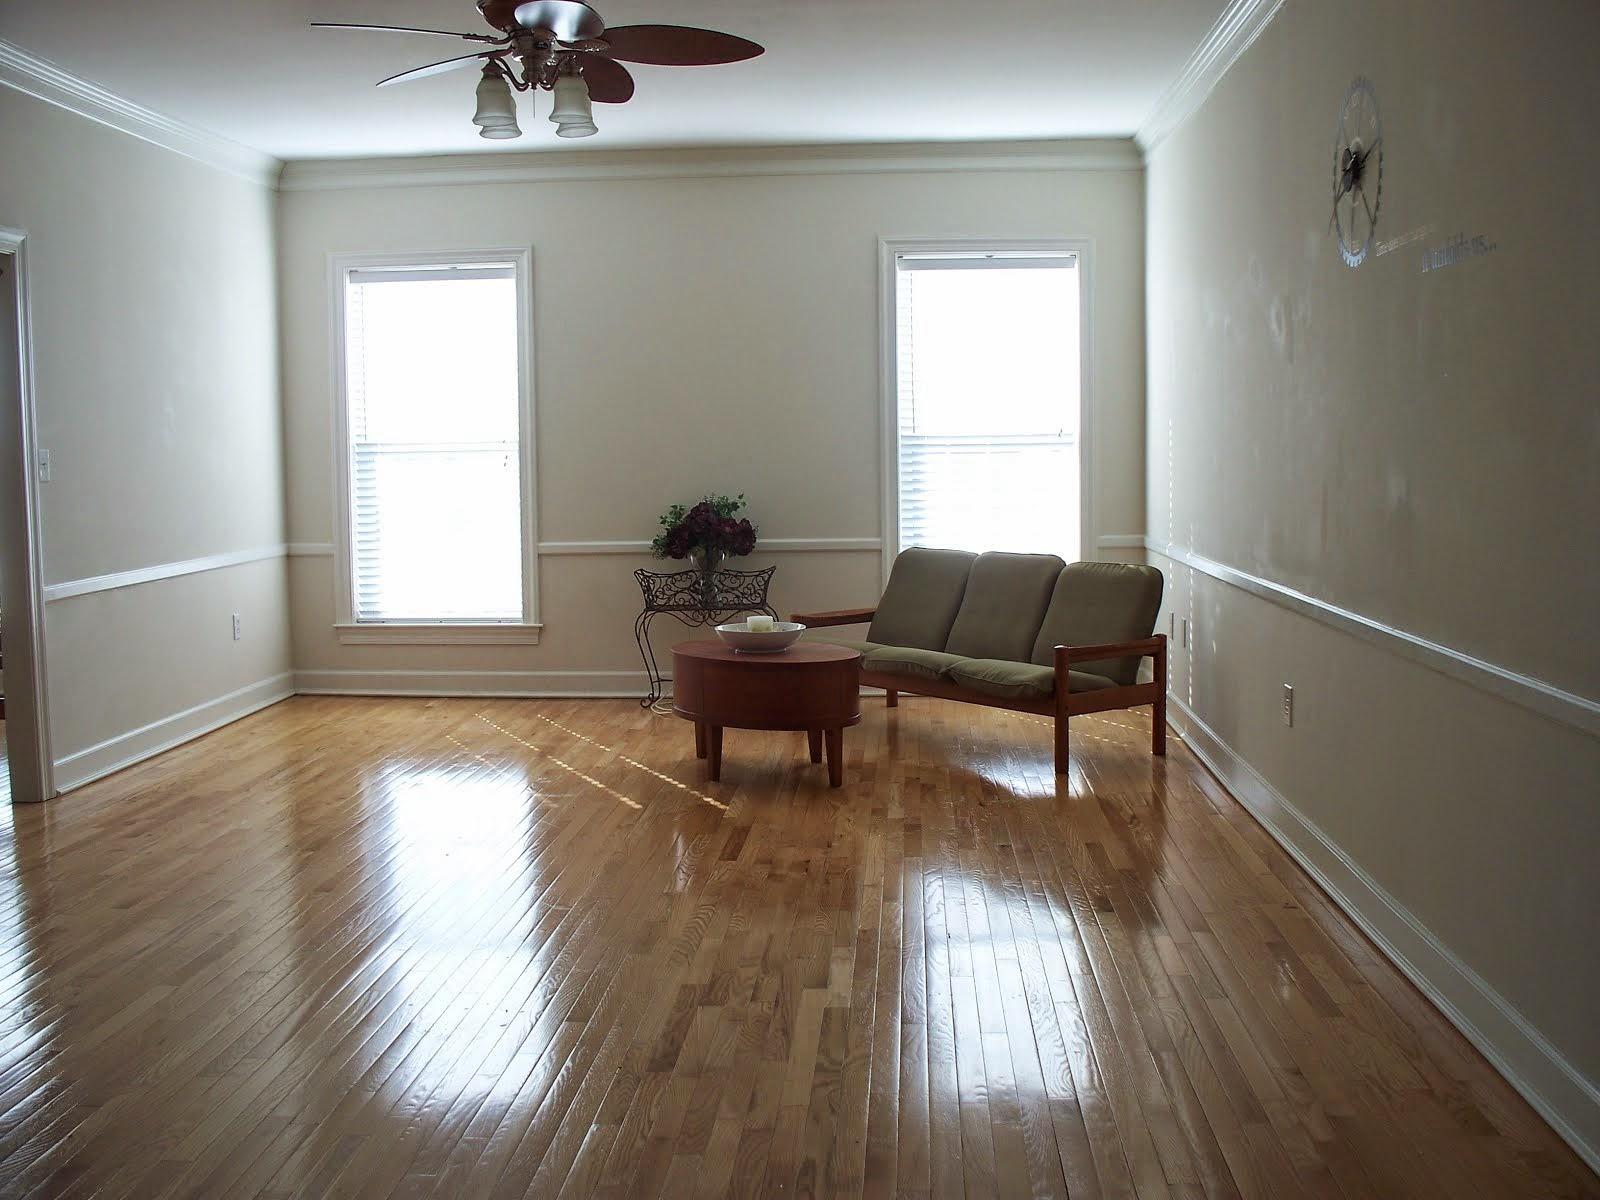 Prince Charles Condominium, 300 Fulton Street N, Salisbury NC ~ $229,000